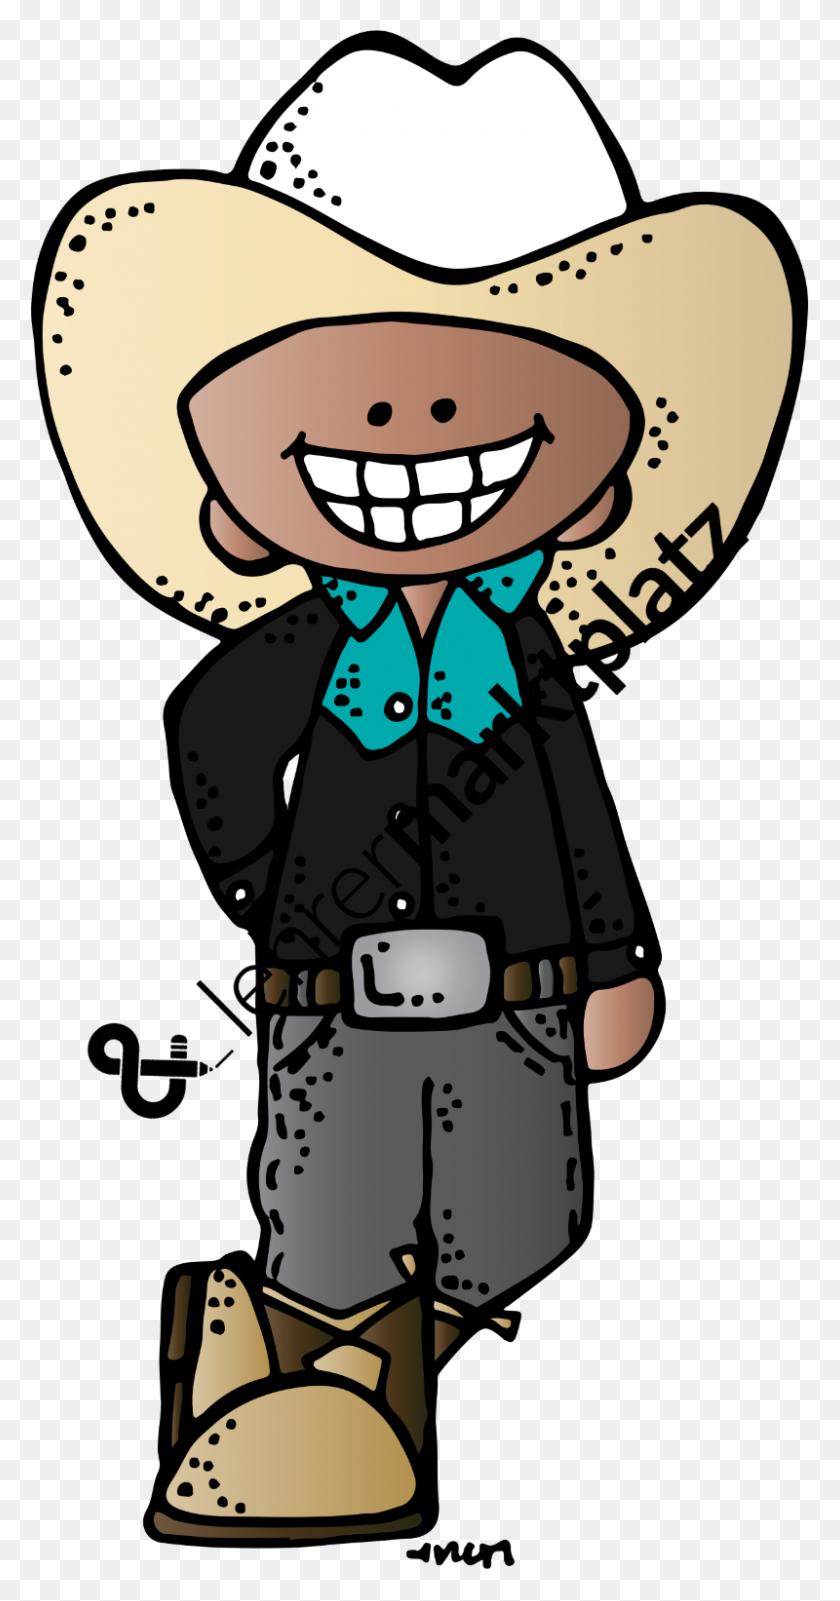 800x1581 Clip Art Cowboys Und Cowgirls - Cowboy And Cowgirl Clipart